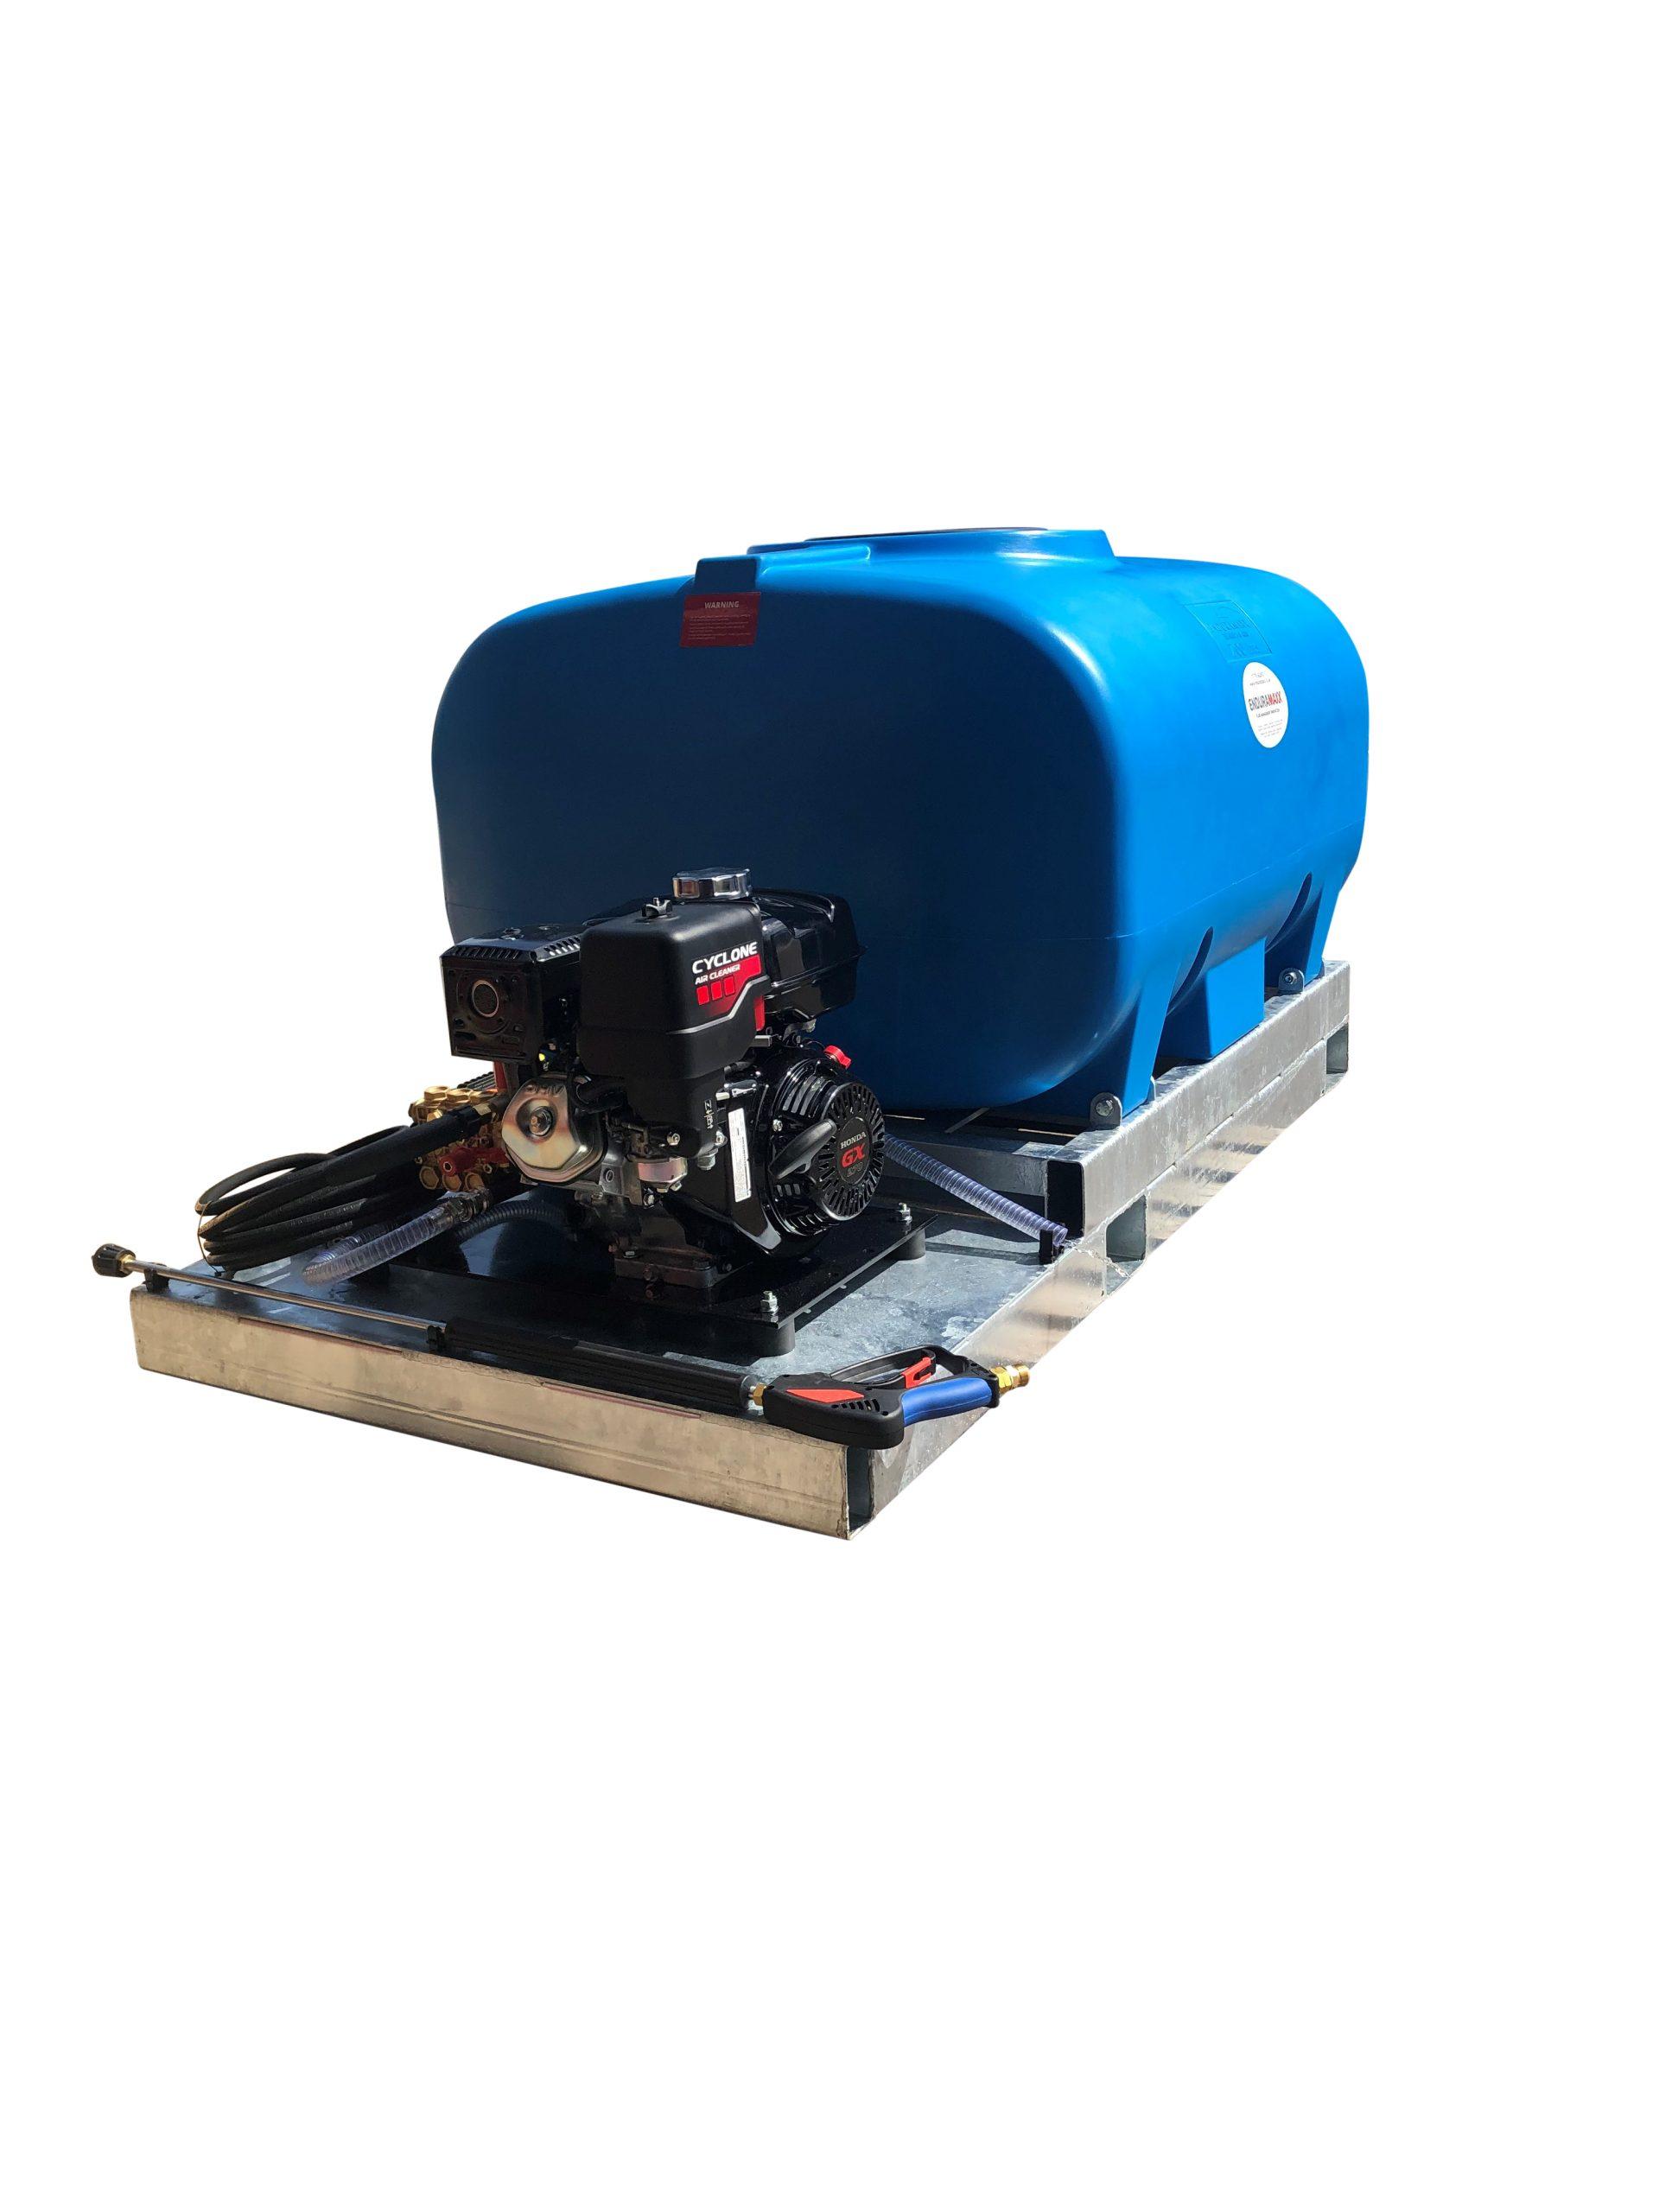 Skid Pressure Washer Bowser